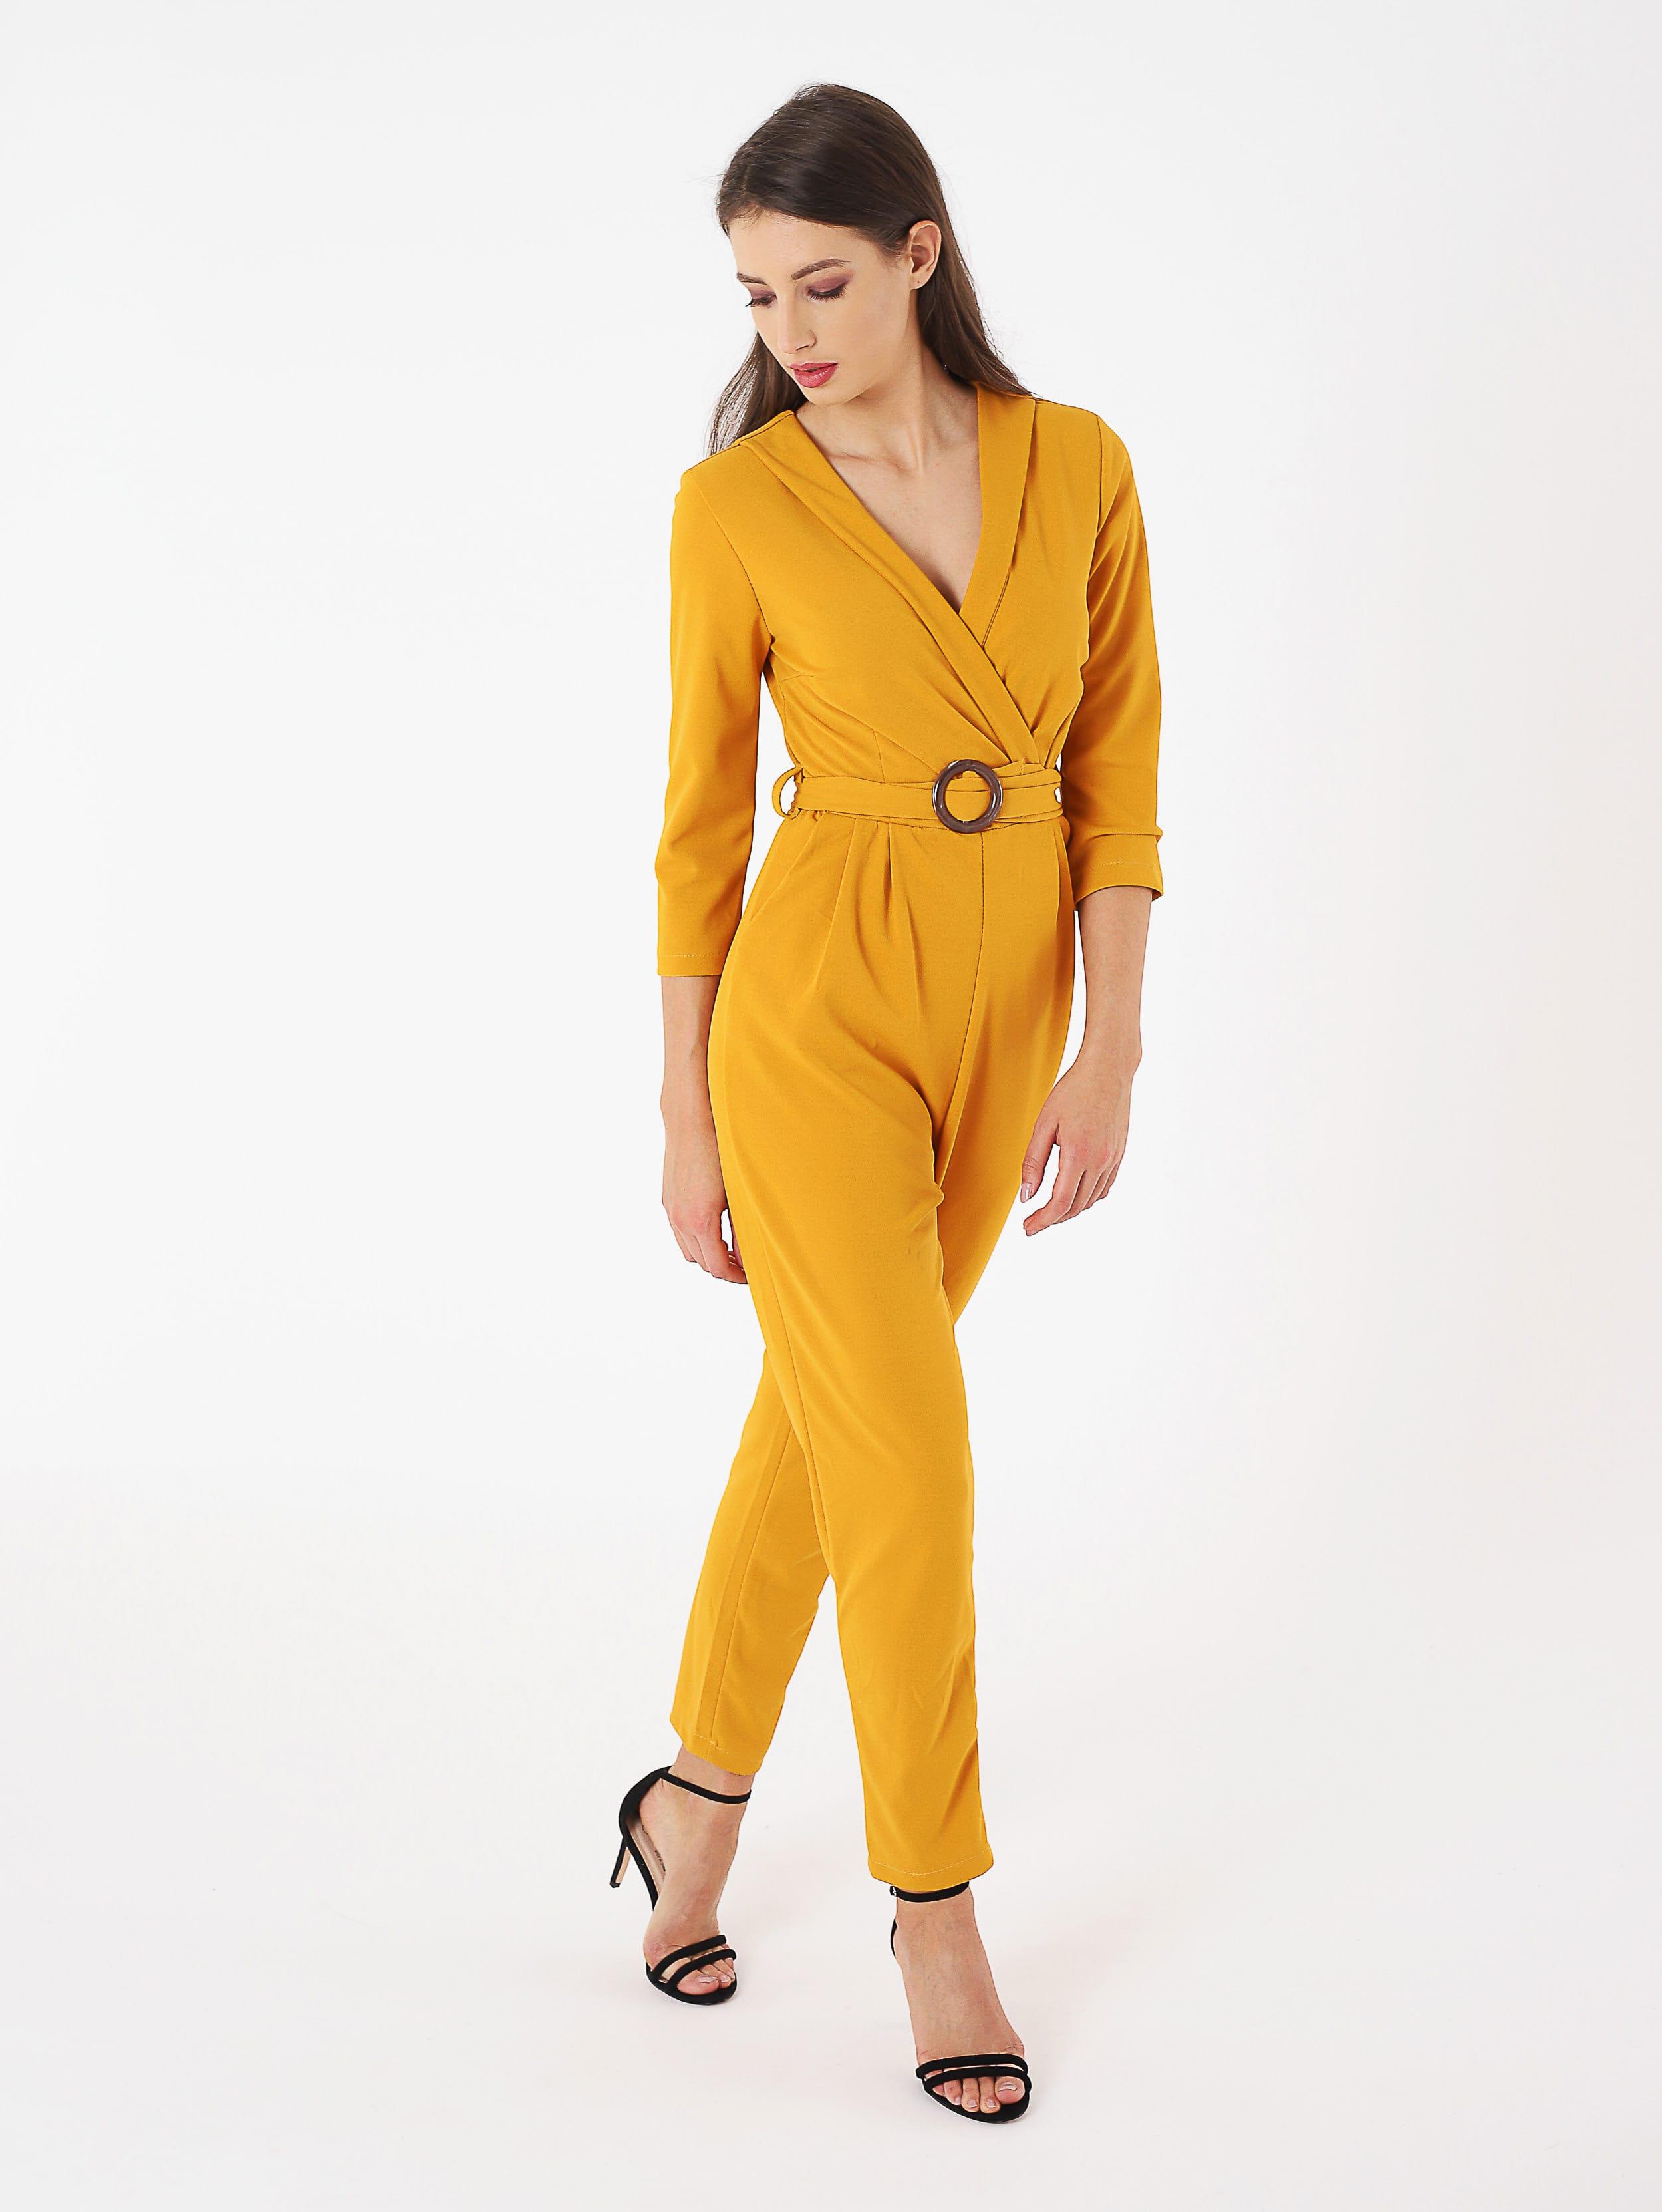 Tuta jumpsuit giallo ocra Terranova a 29,99 euro